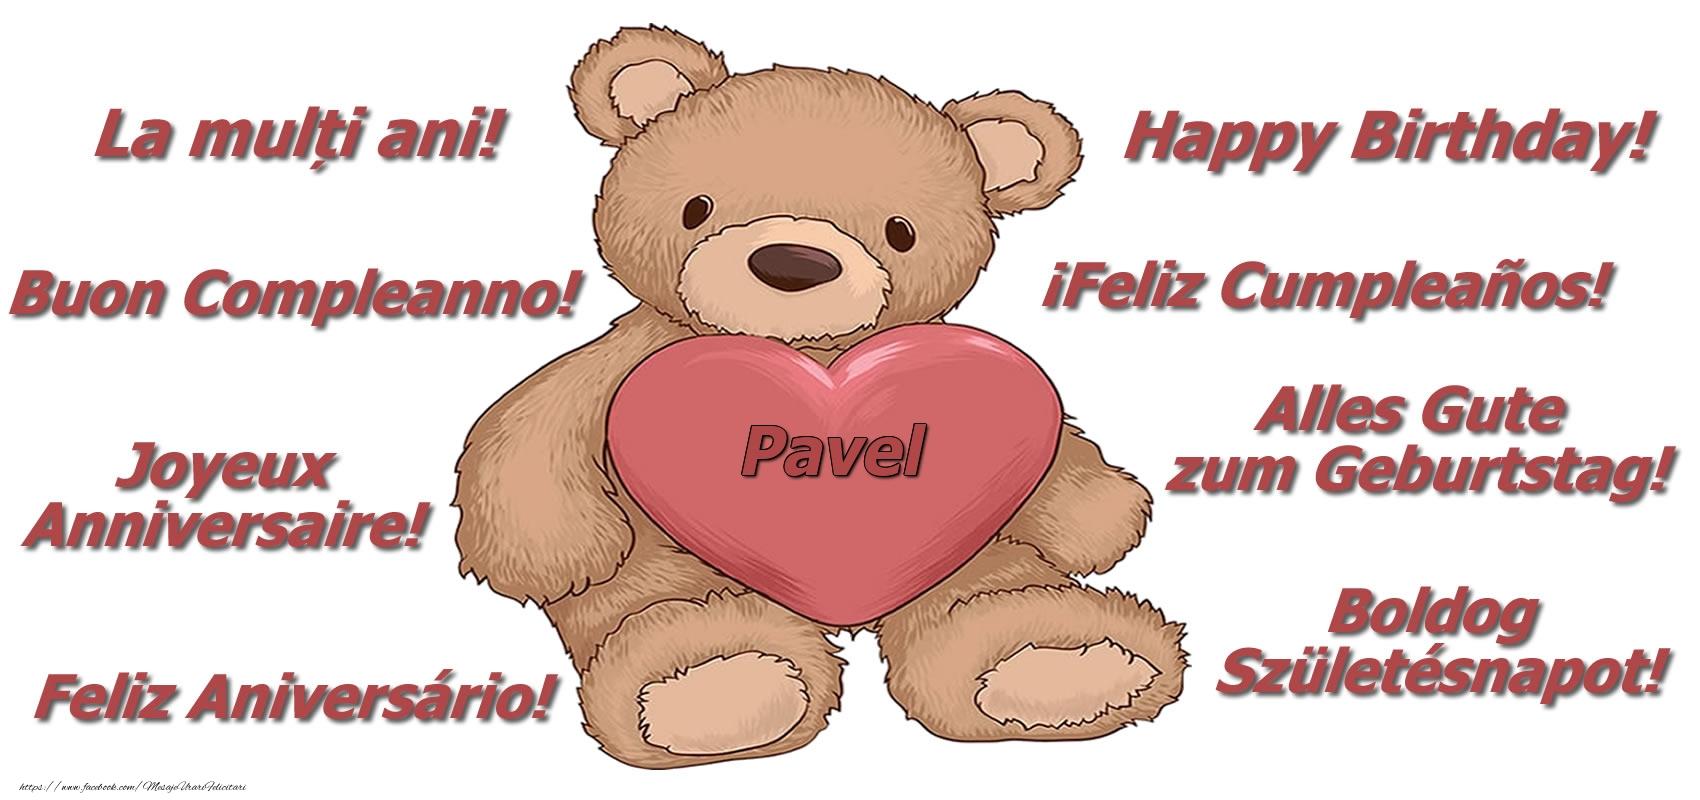 Felicitari de zi de nastere - La multi ani Pavel! - Ursulet